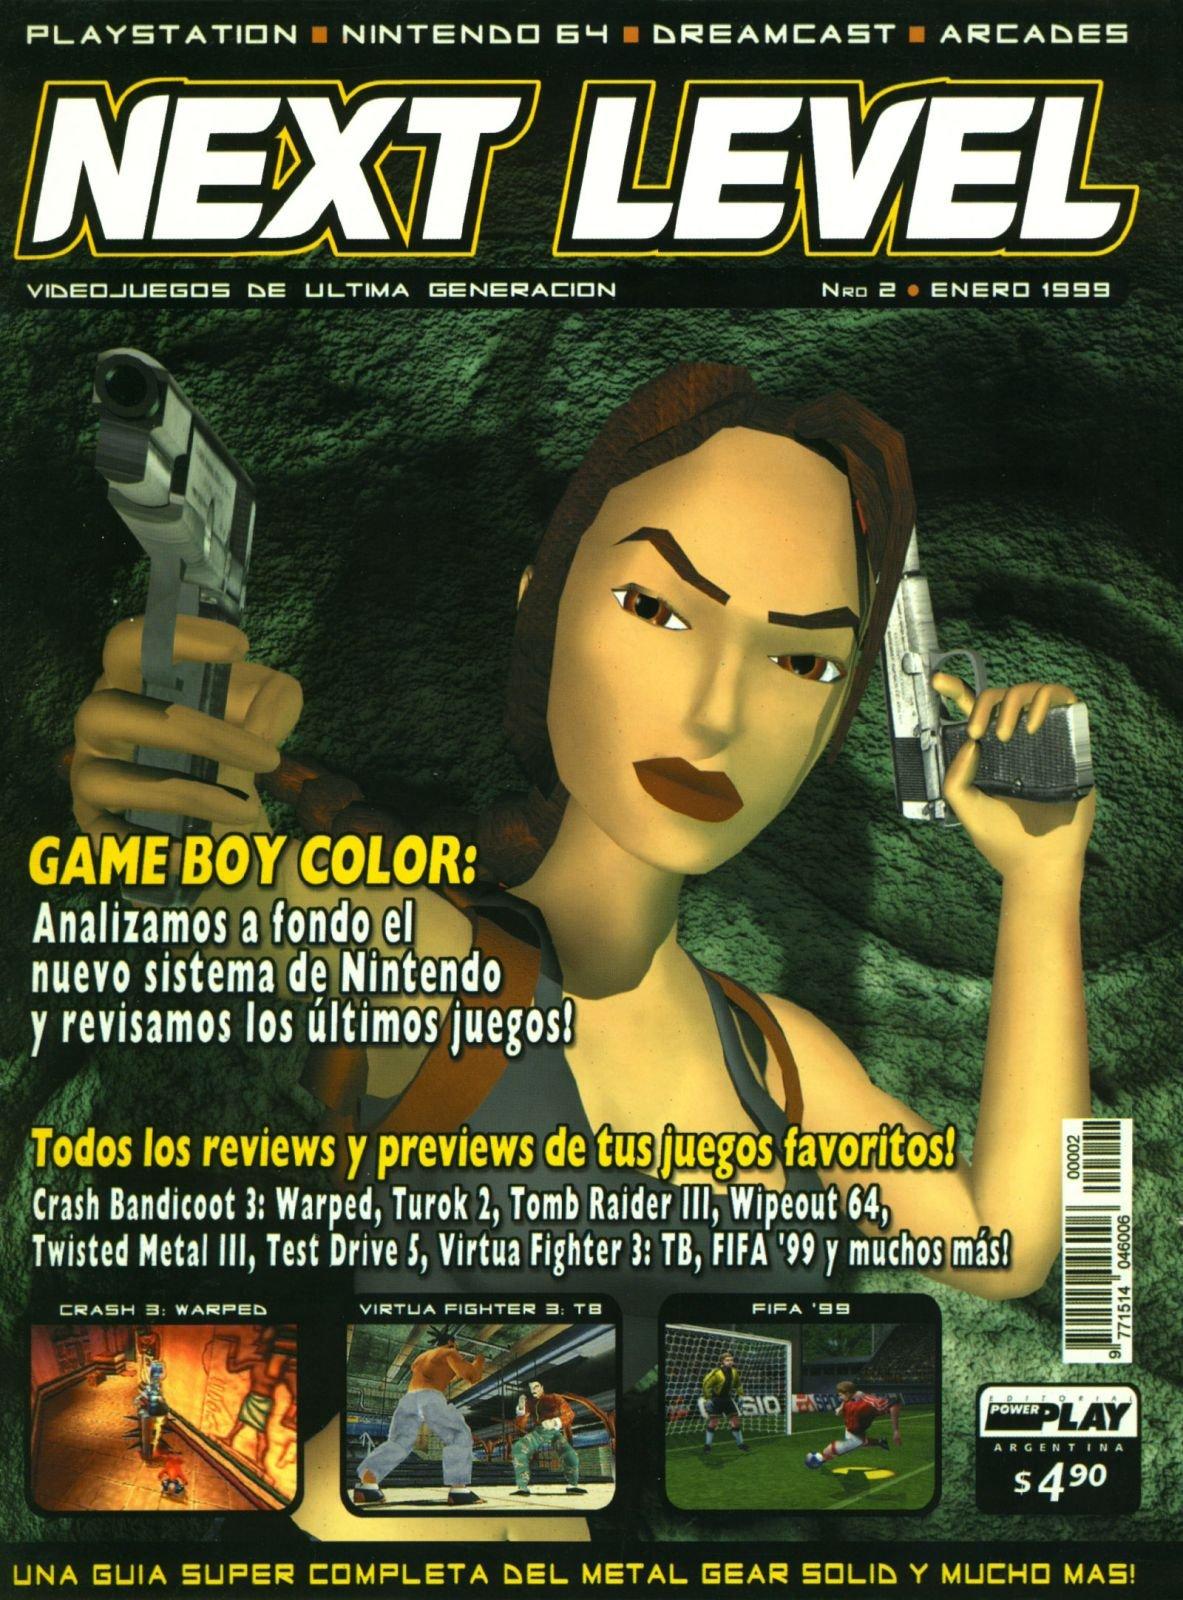 Next Level 02 January 1999